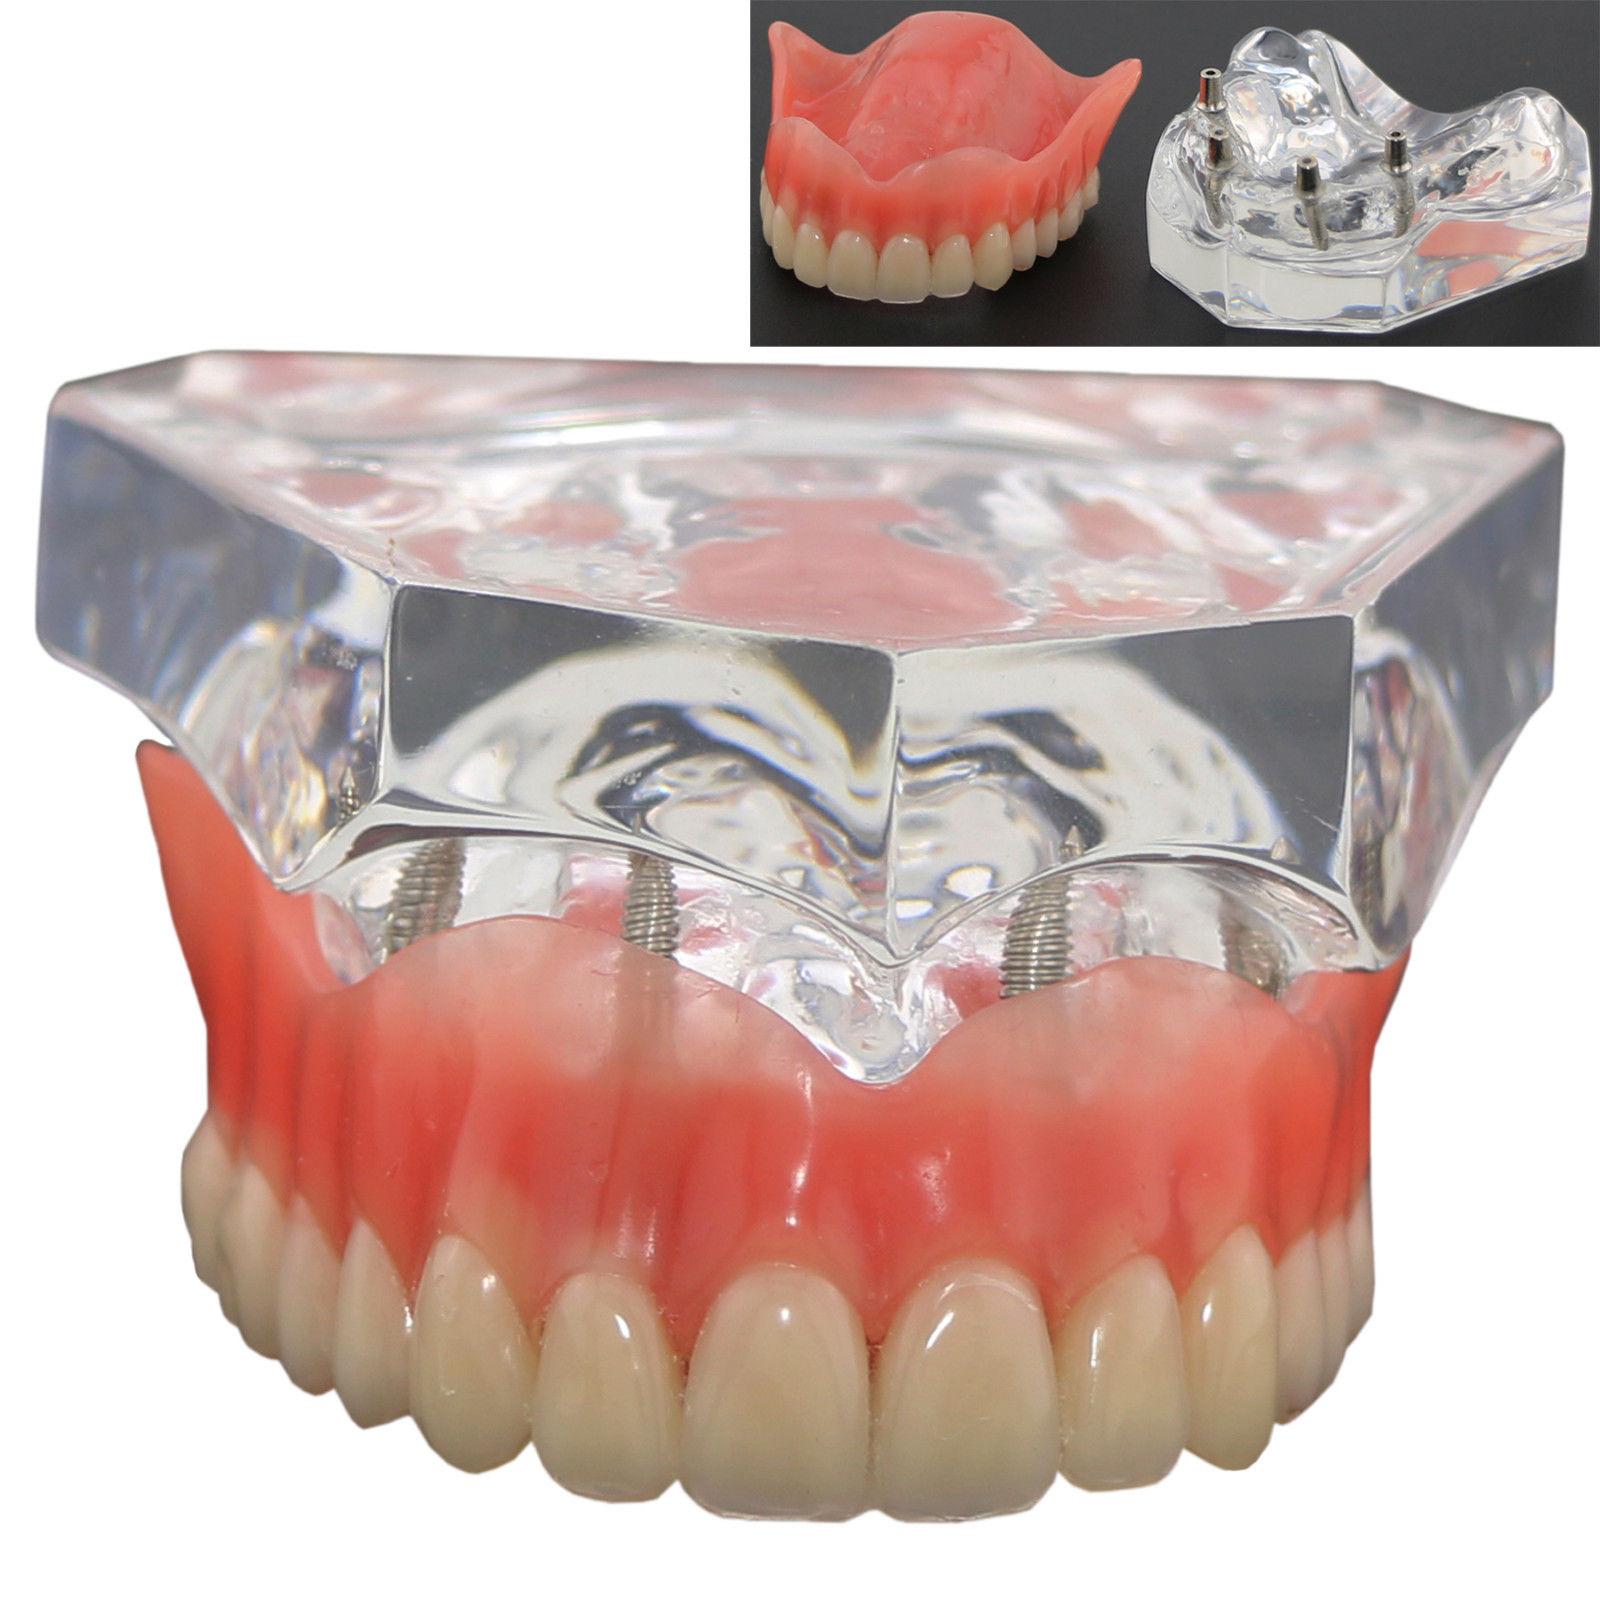 Dental Upper Teeth Model Overdenture Superior 4 Implants Demo Model 6001 02